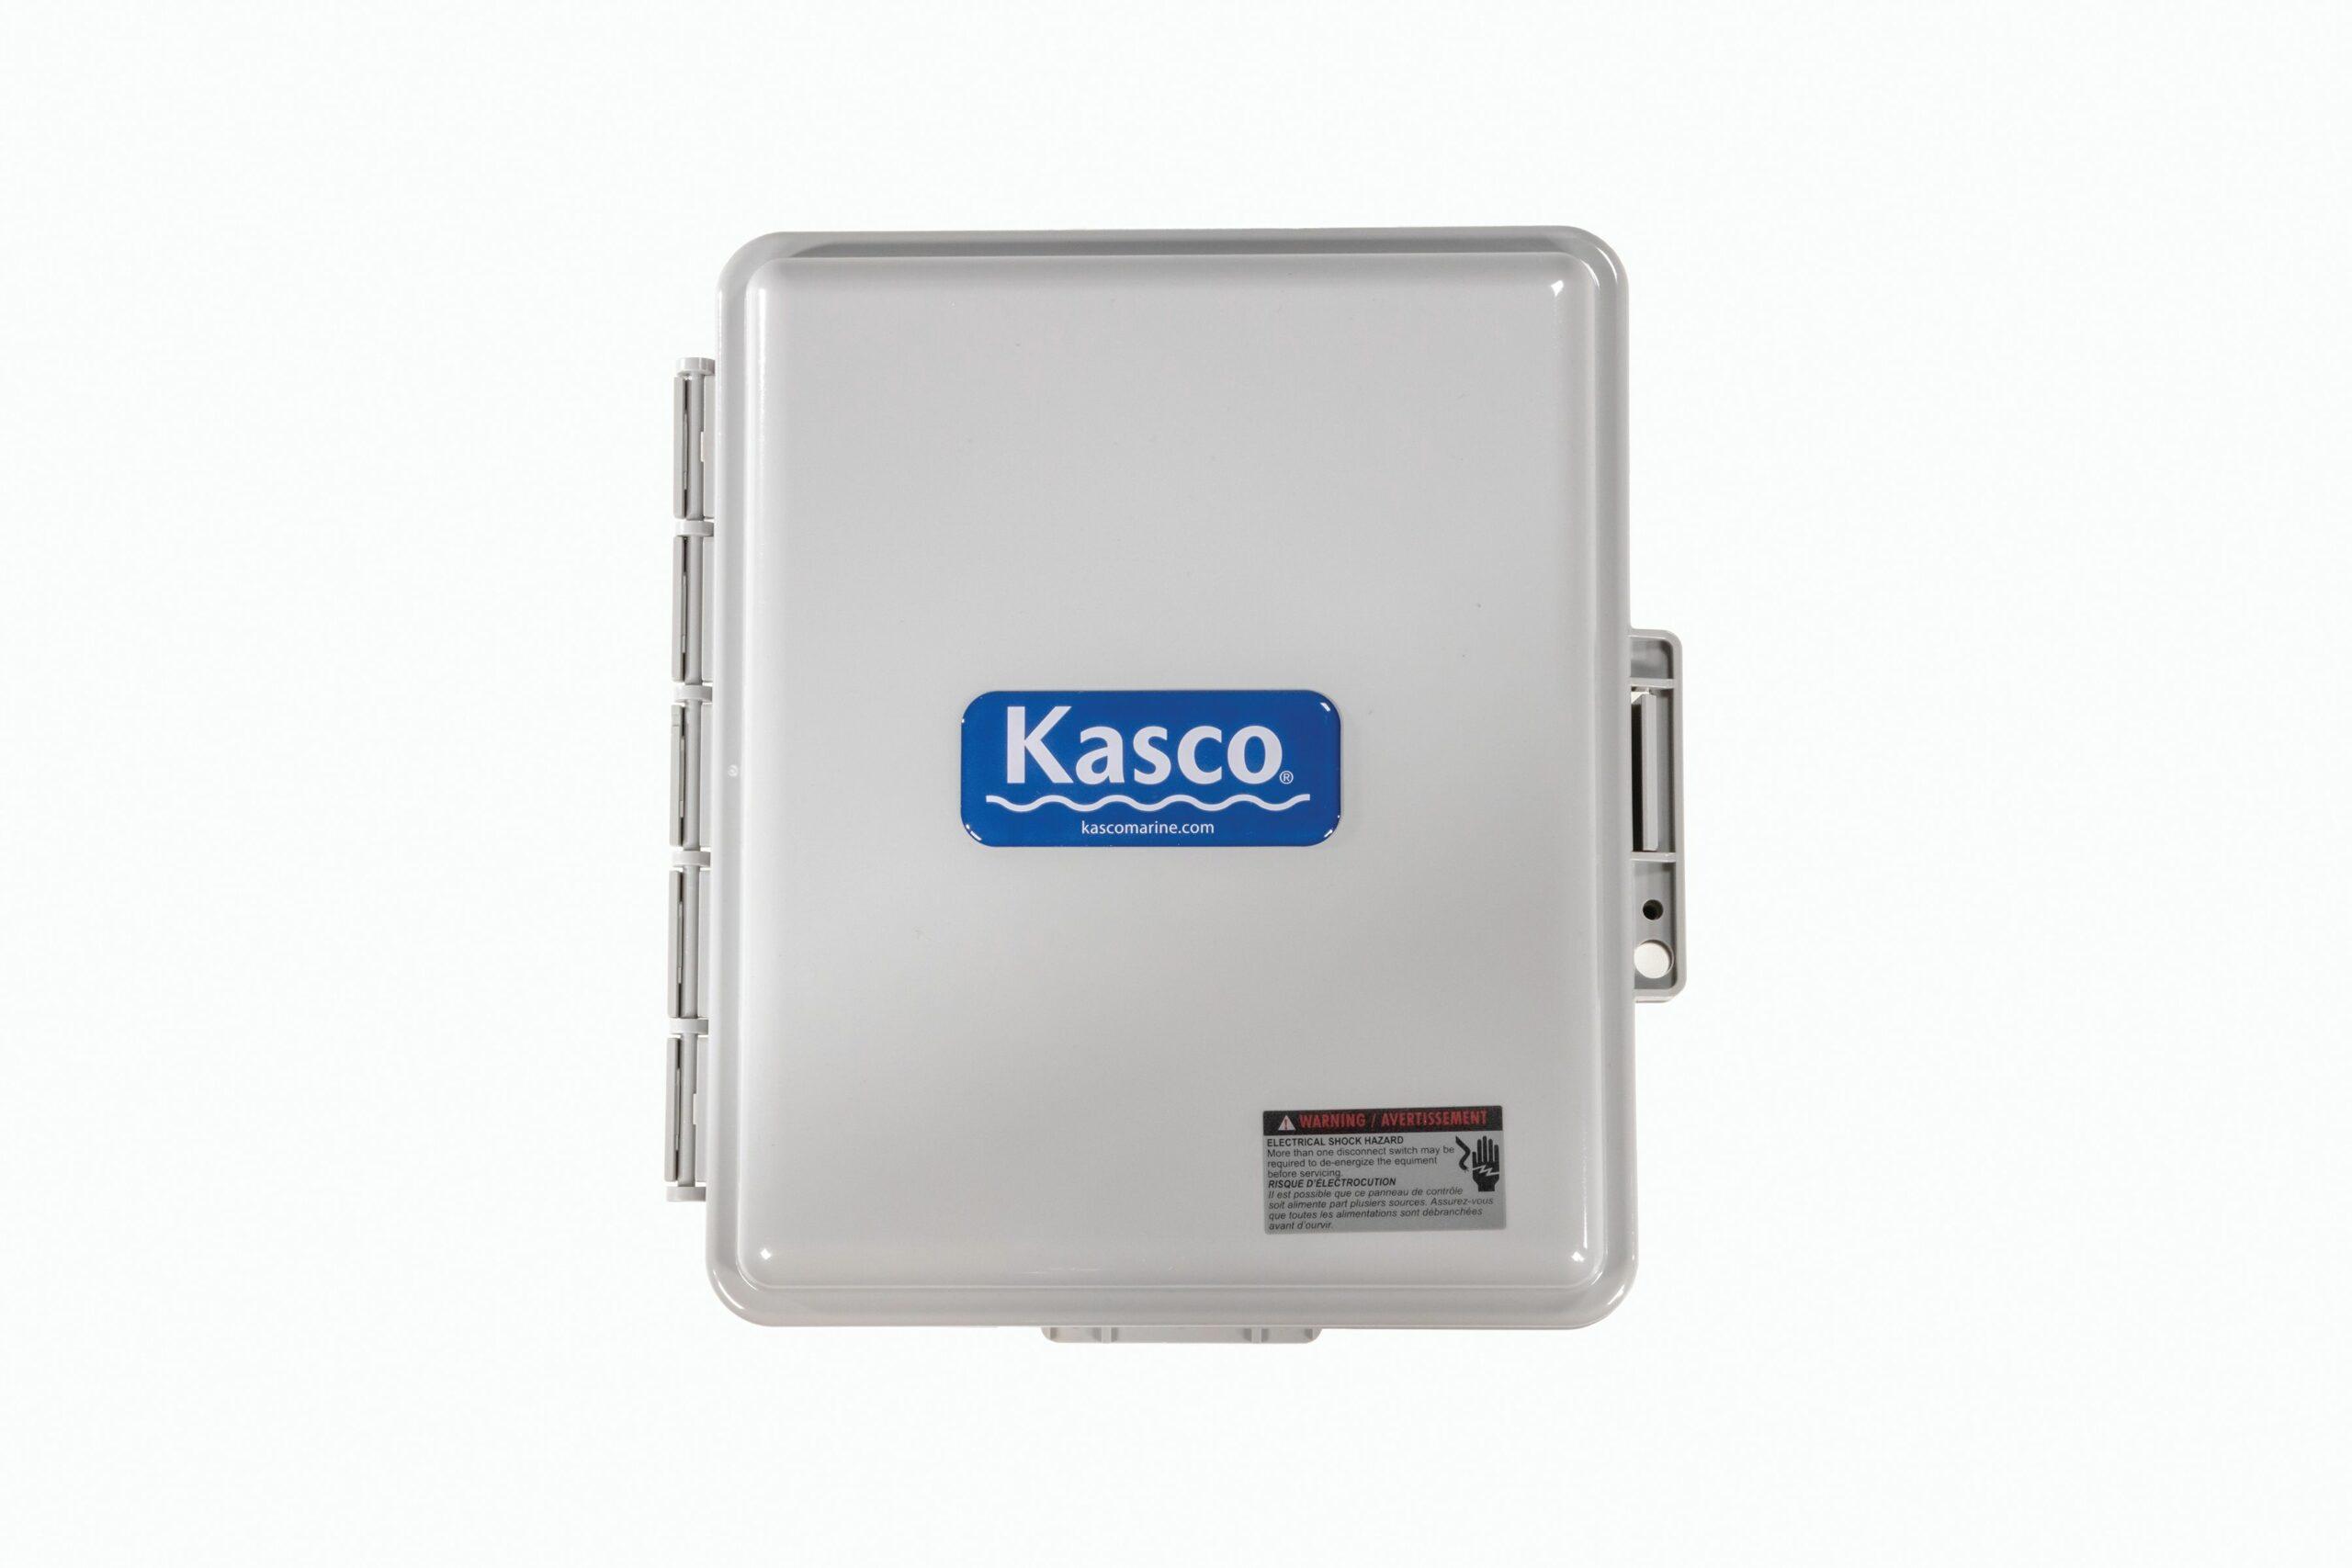 C-95 30A/240V Control Panel for 3 – 5 HP Kasco Fountains, Circulators & Surface Aerators